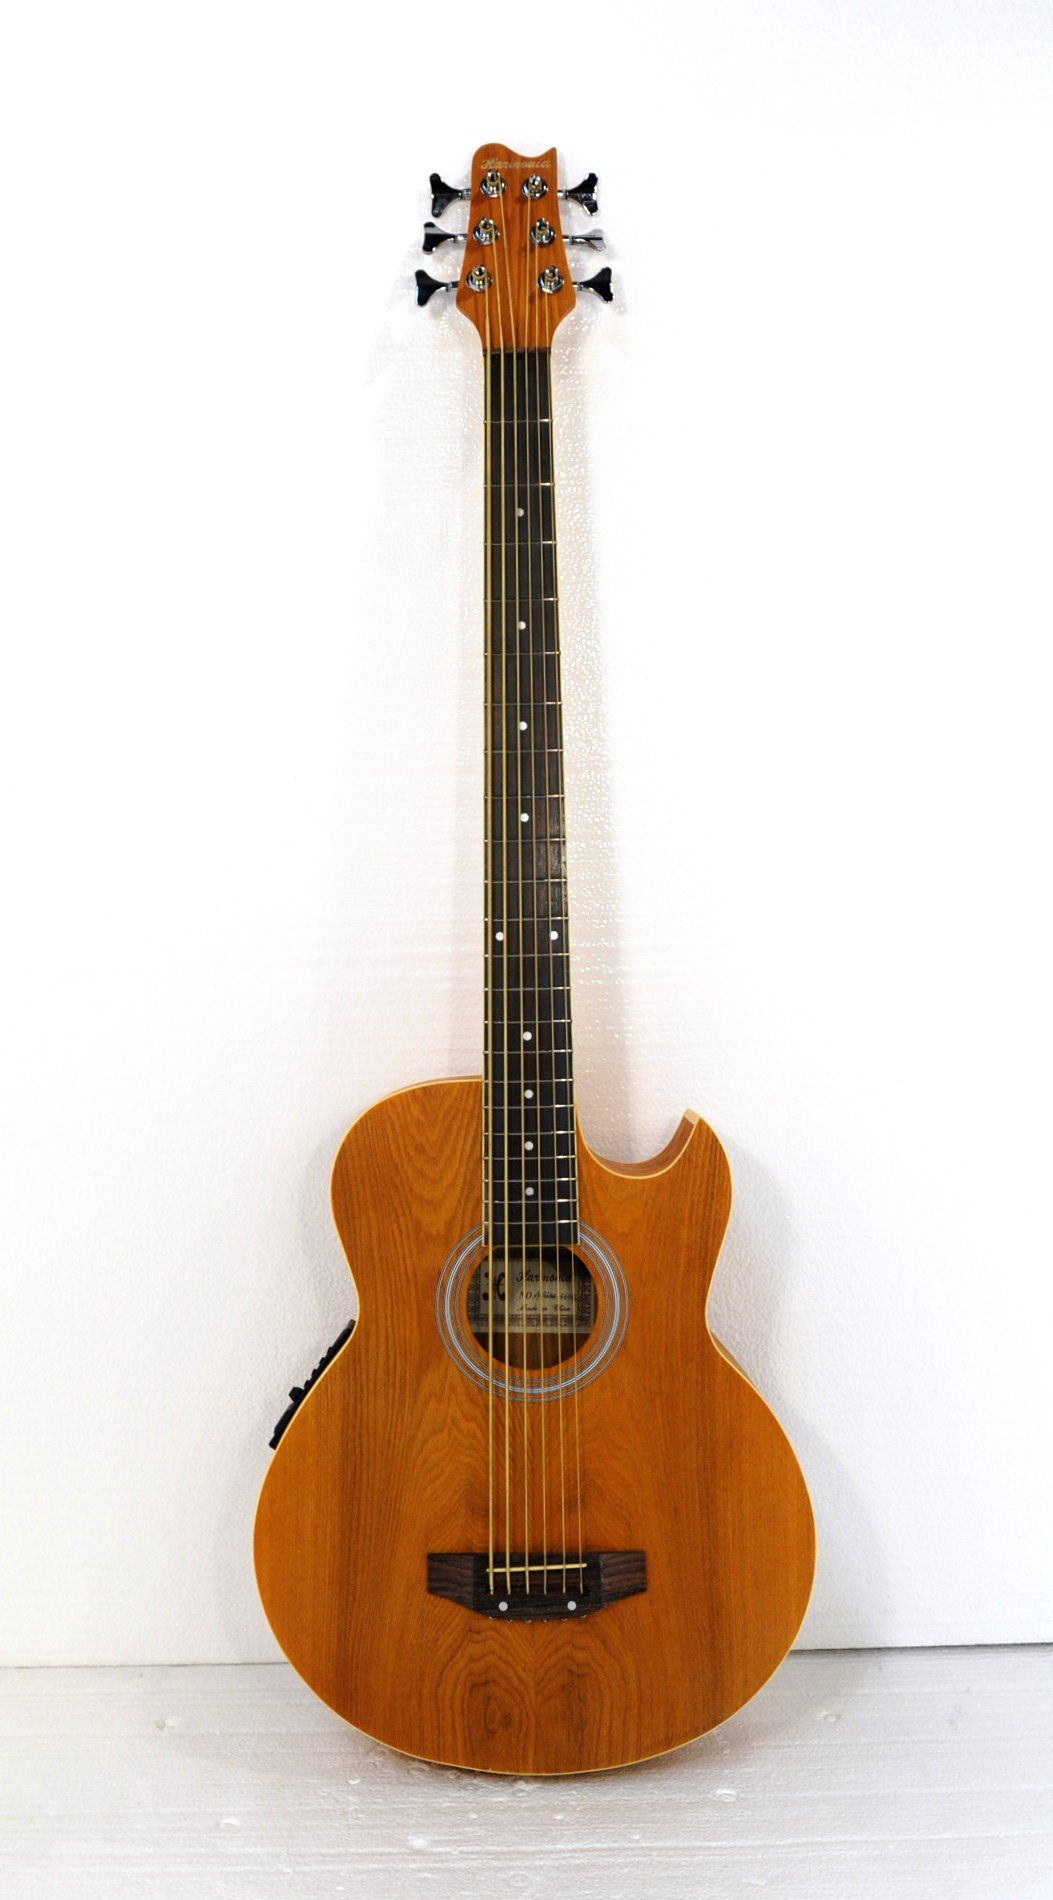 6 String Acoustic Electric Cutaway Bass Guitar